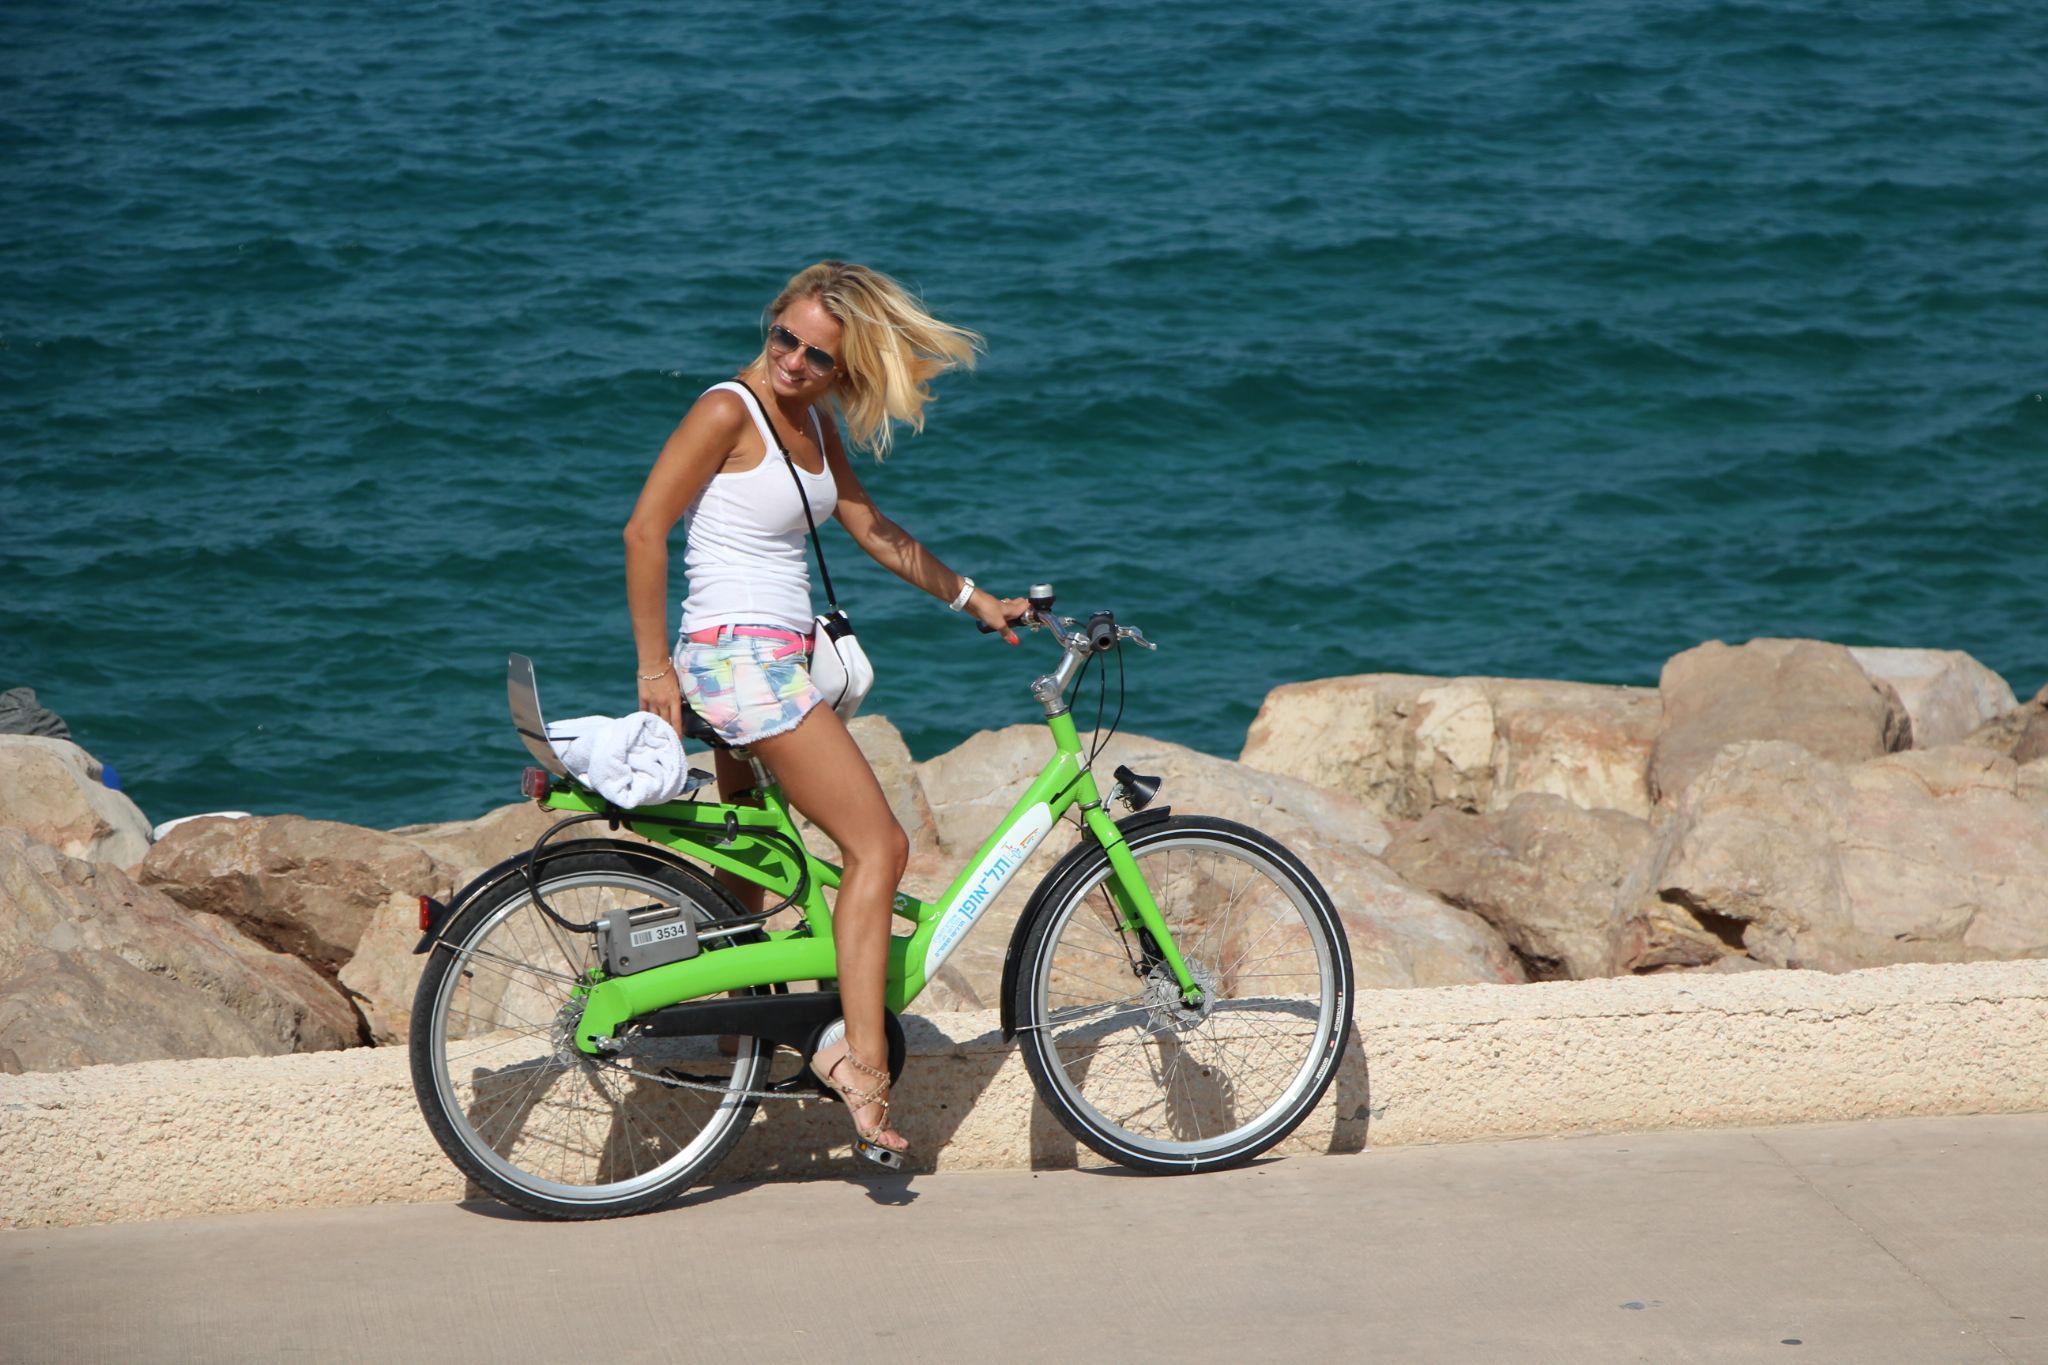 Riding by oren.yacob